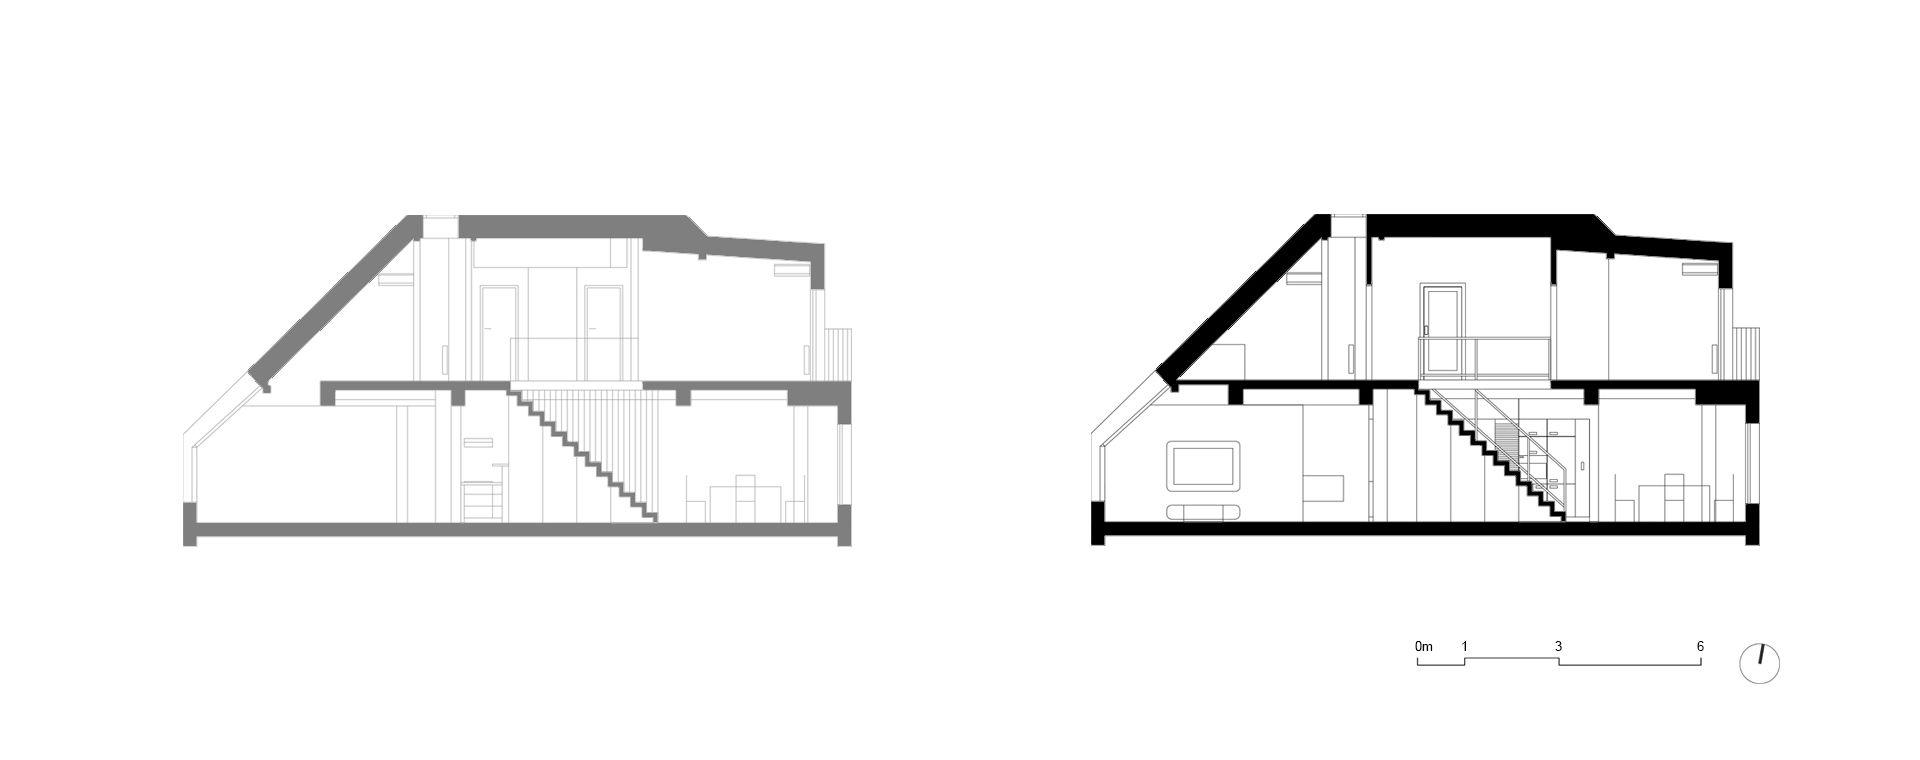 Rekonstrukce bytu Praha Vinohrady, Prague, 2010-2012, CZ